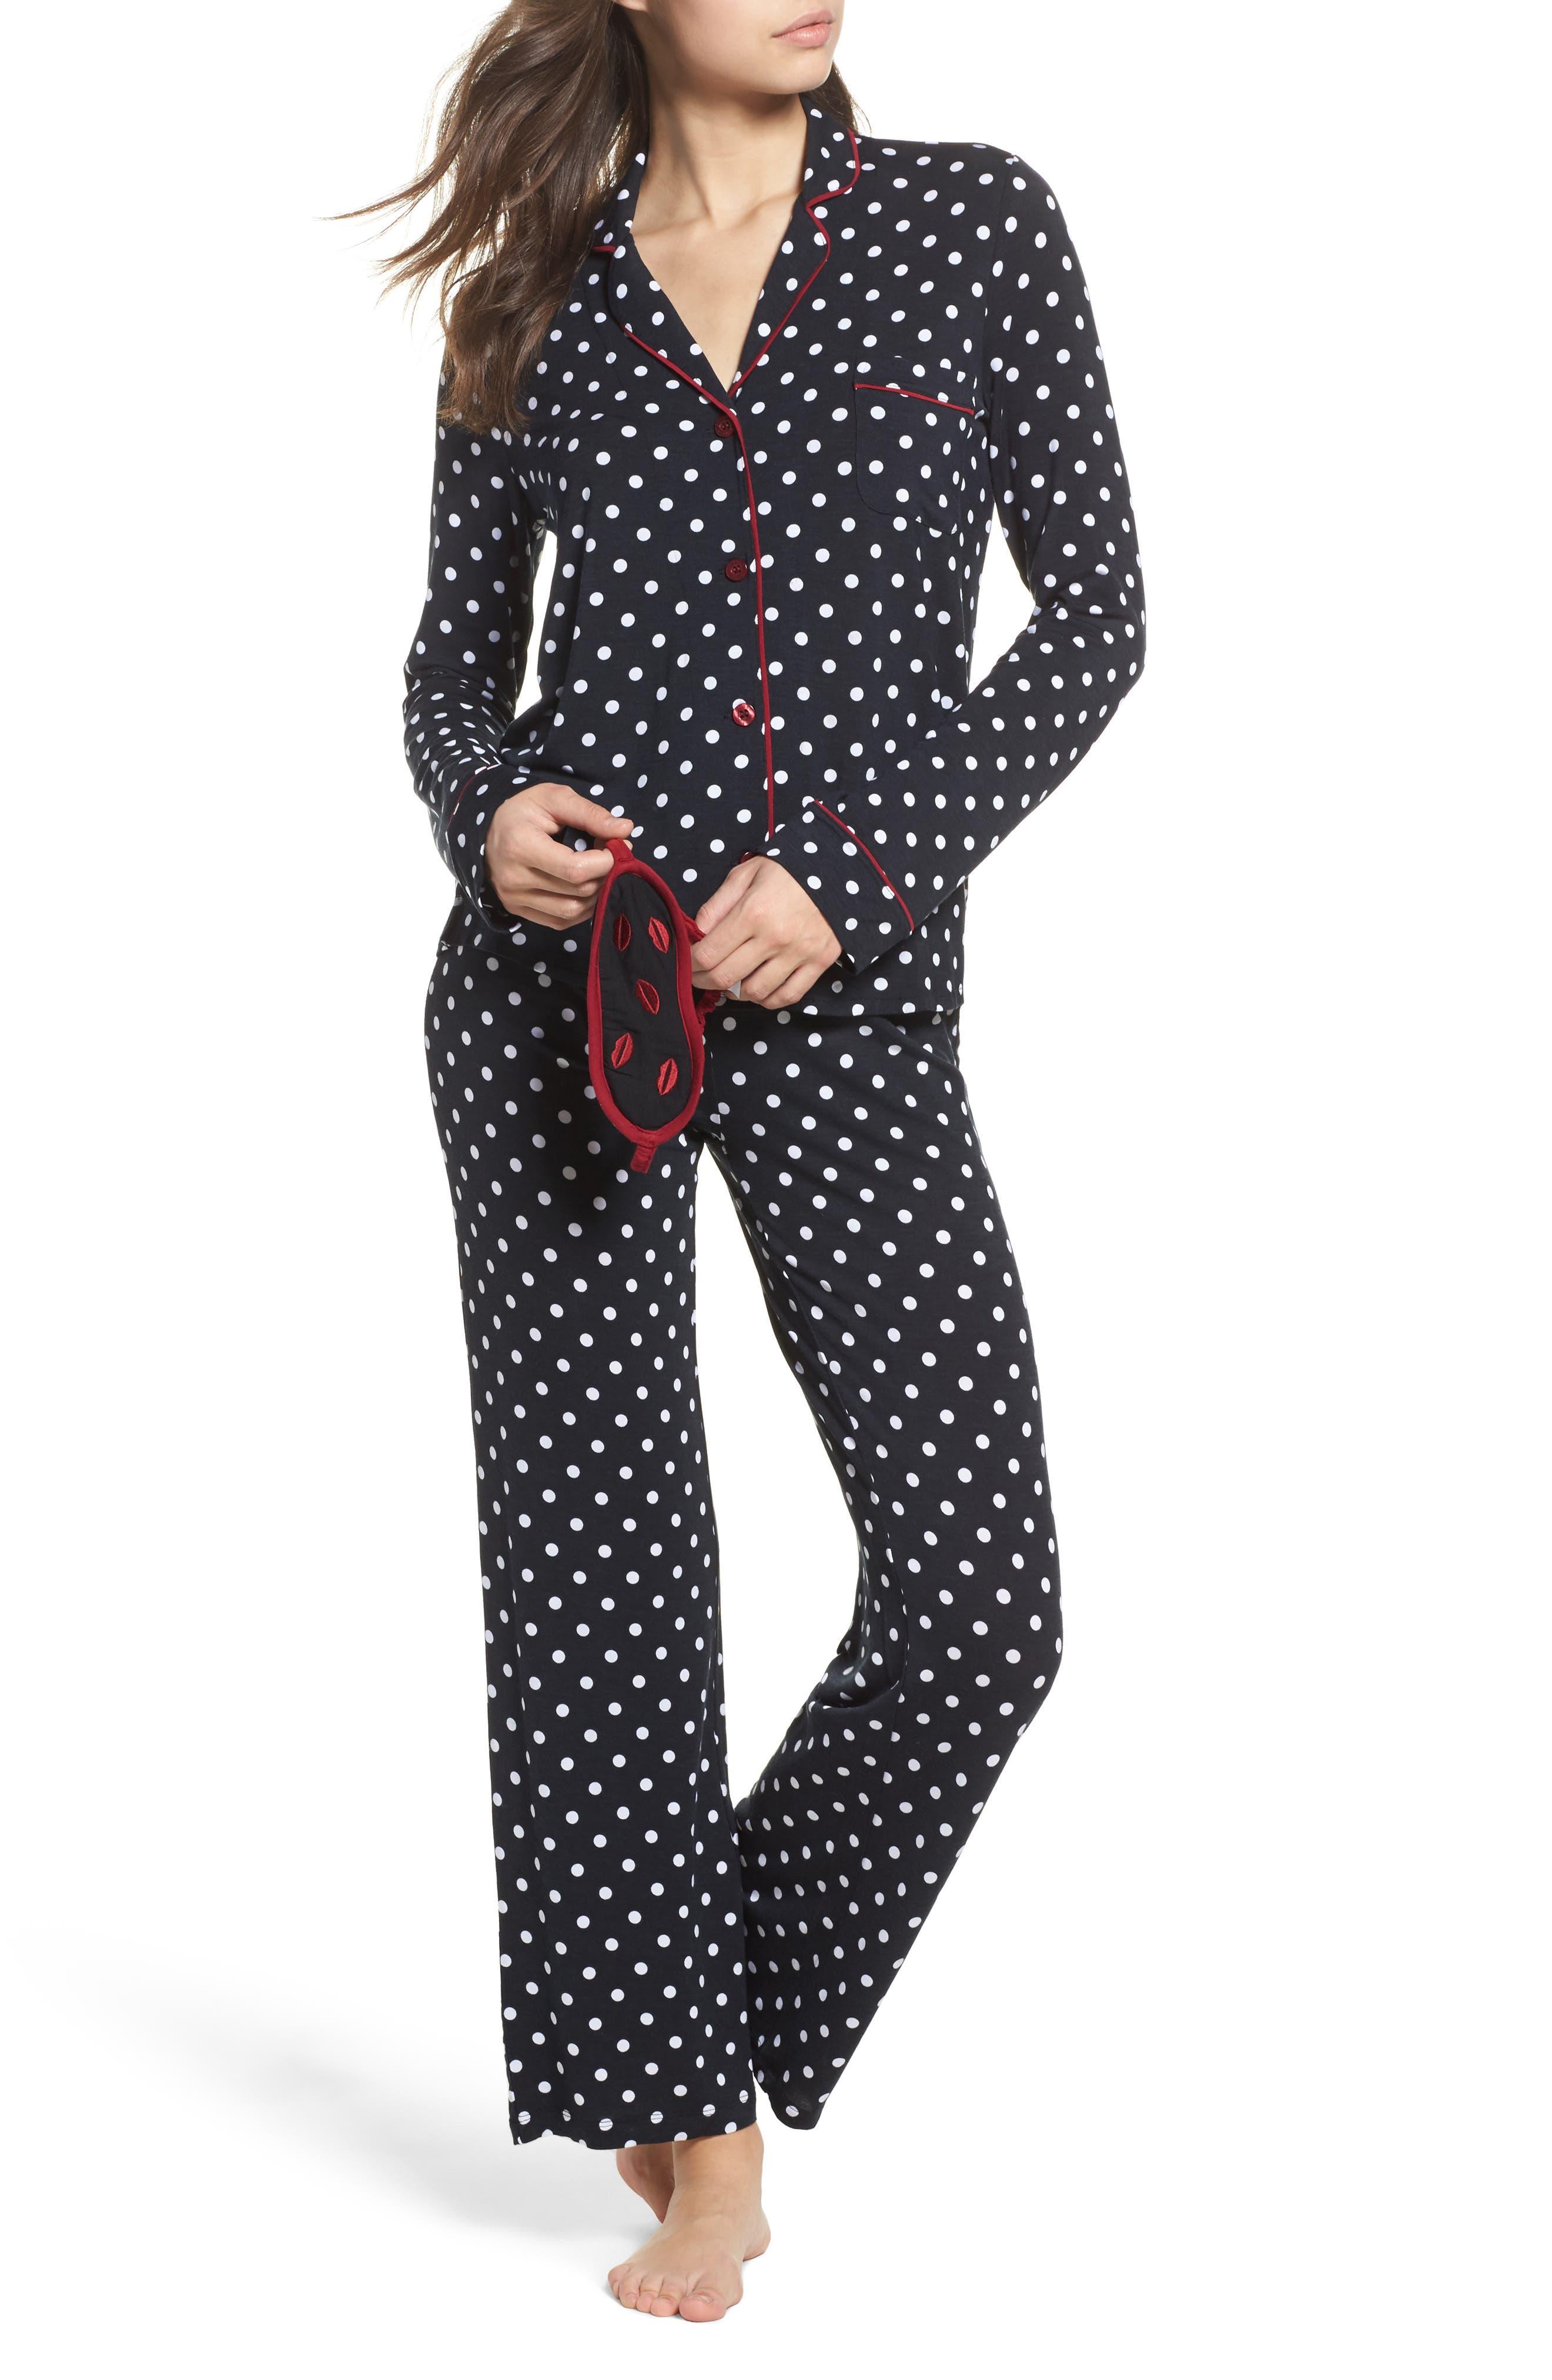 Stretch Modal Pajamas & Eye Mask,                         Main,                         color, Black